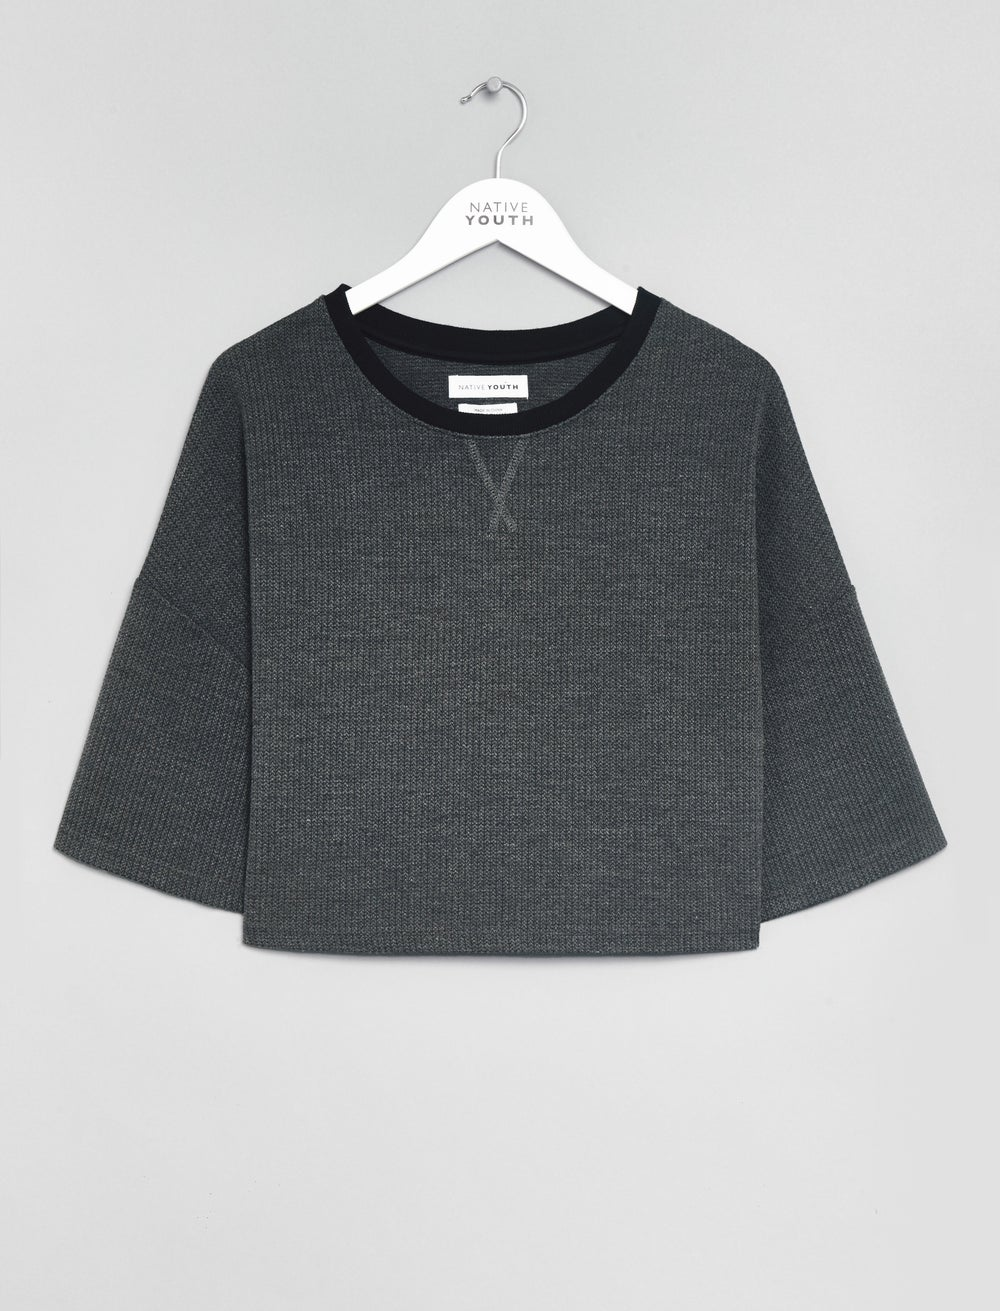 Image of Native Youth - Cropped Sweatshirt